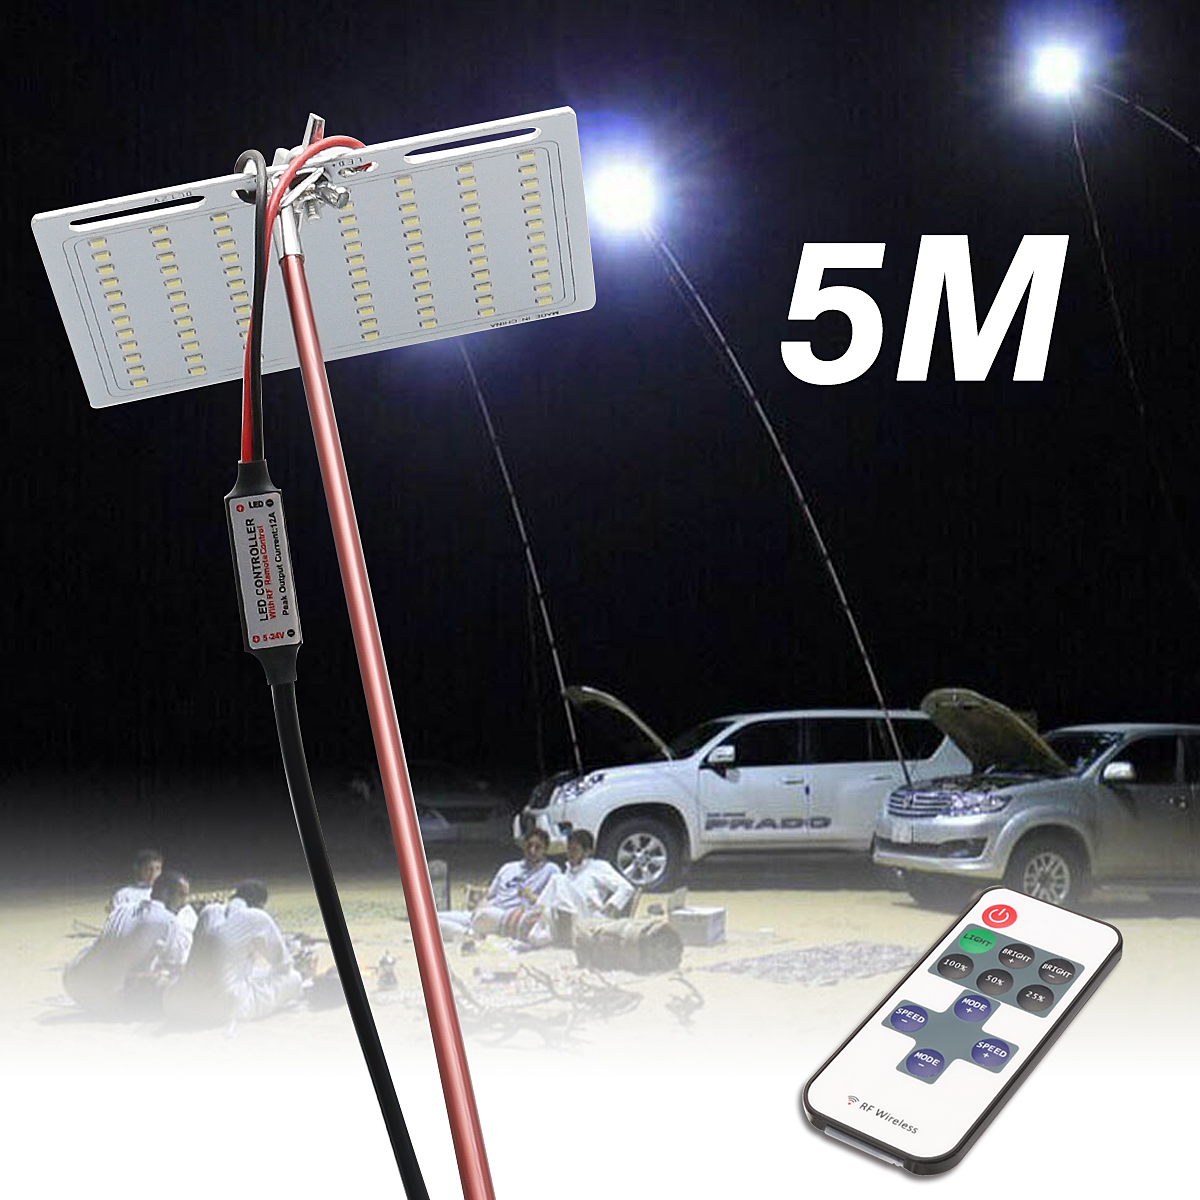 5M Portable Outdoor Lantern Camping Lamp Light Fishing Lamp Car Rod Light RF Remote Controller Outdoor Lighting